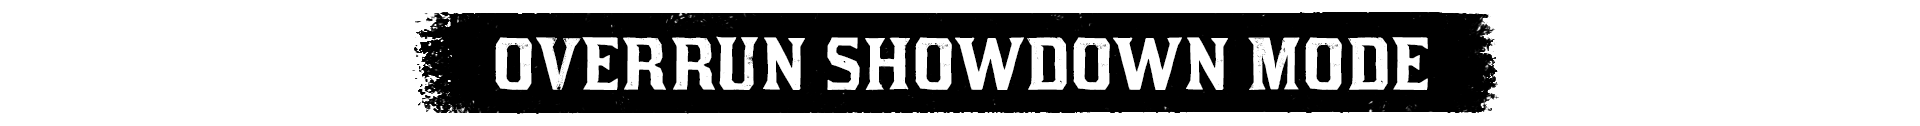 Overrun Showdown Modes